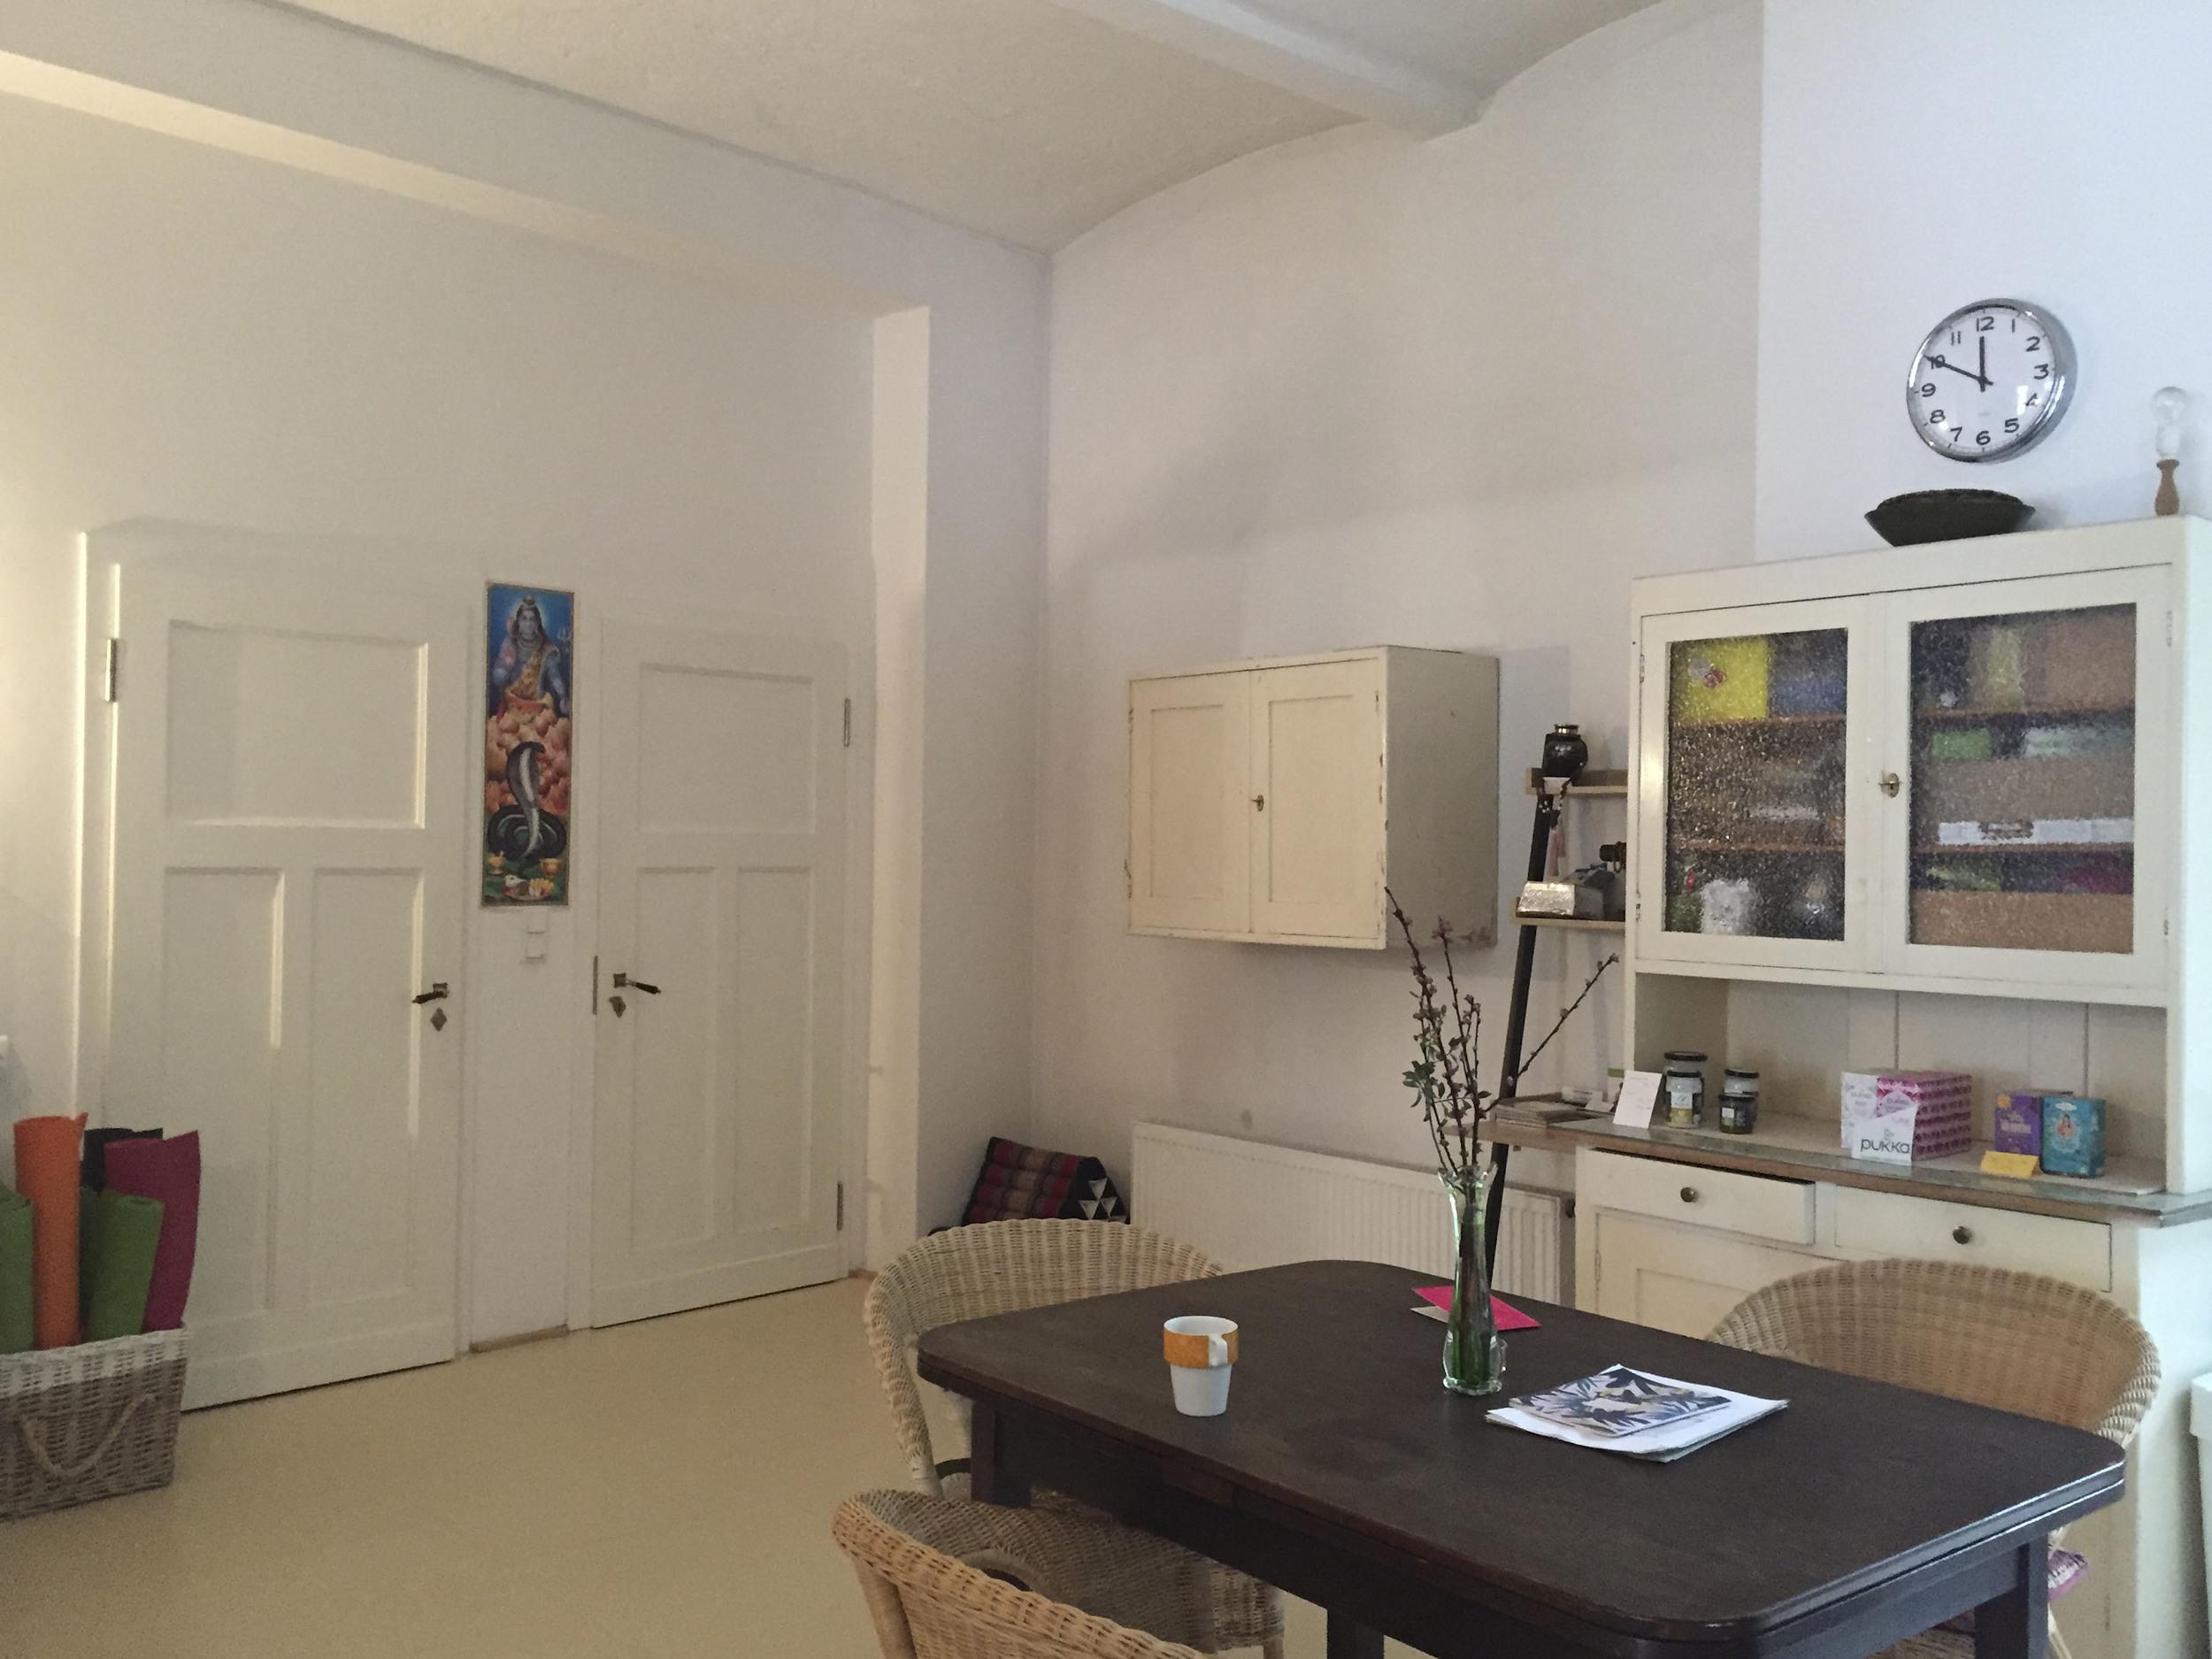 Shivasloft Yoga Studio Düsseldorf Anusara4194.jpg